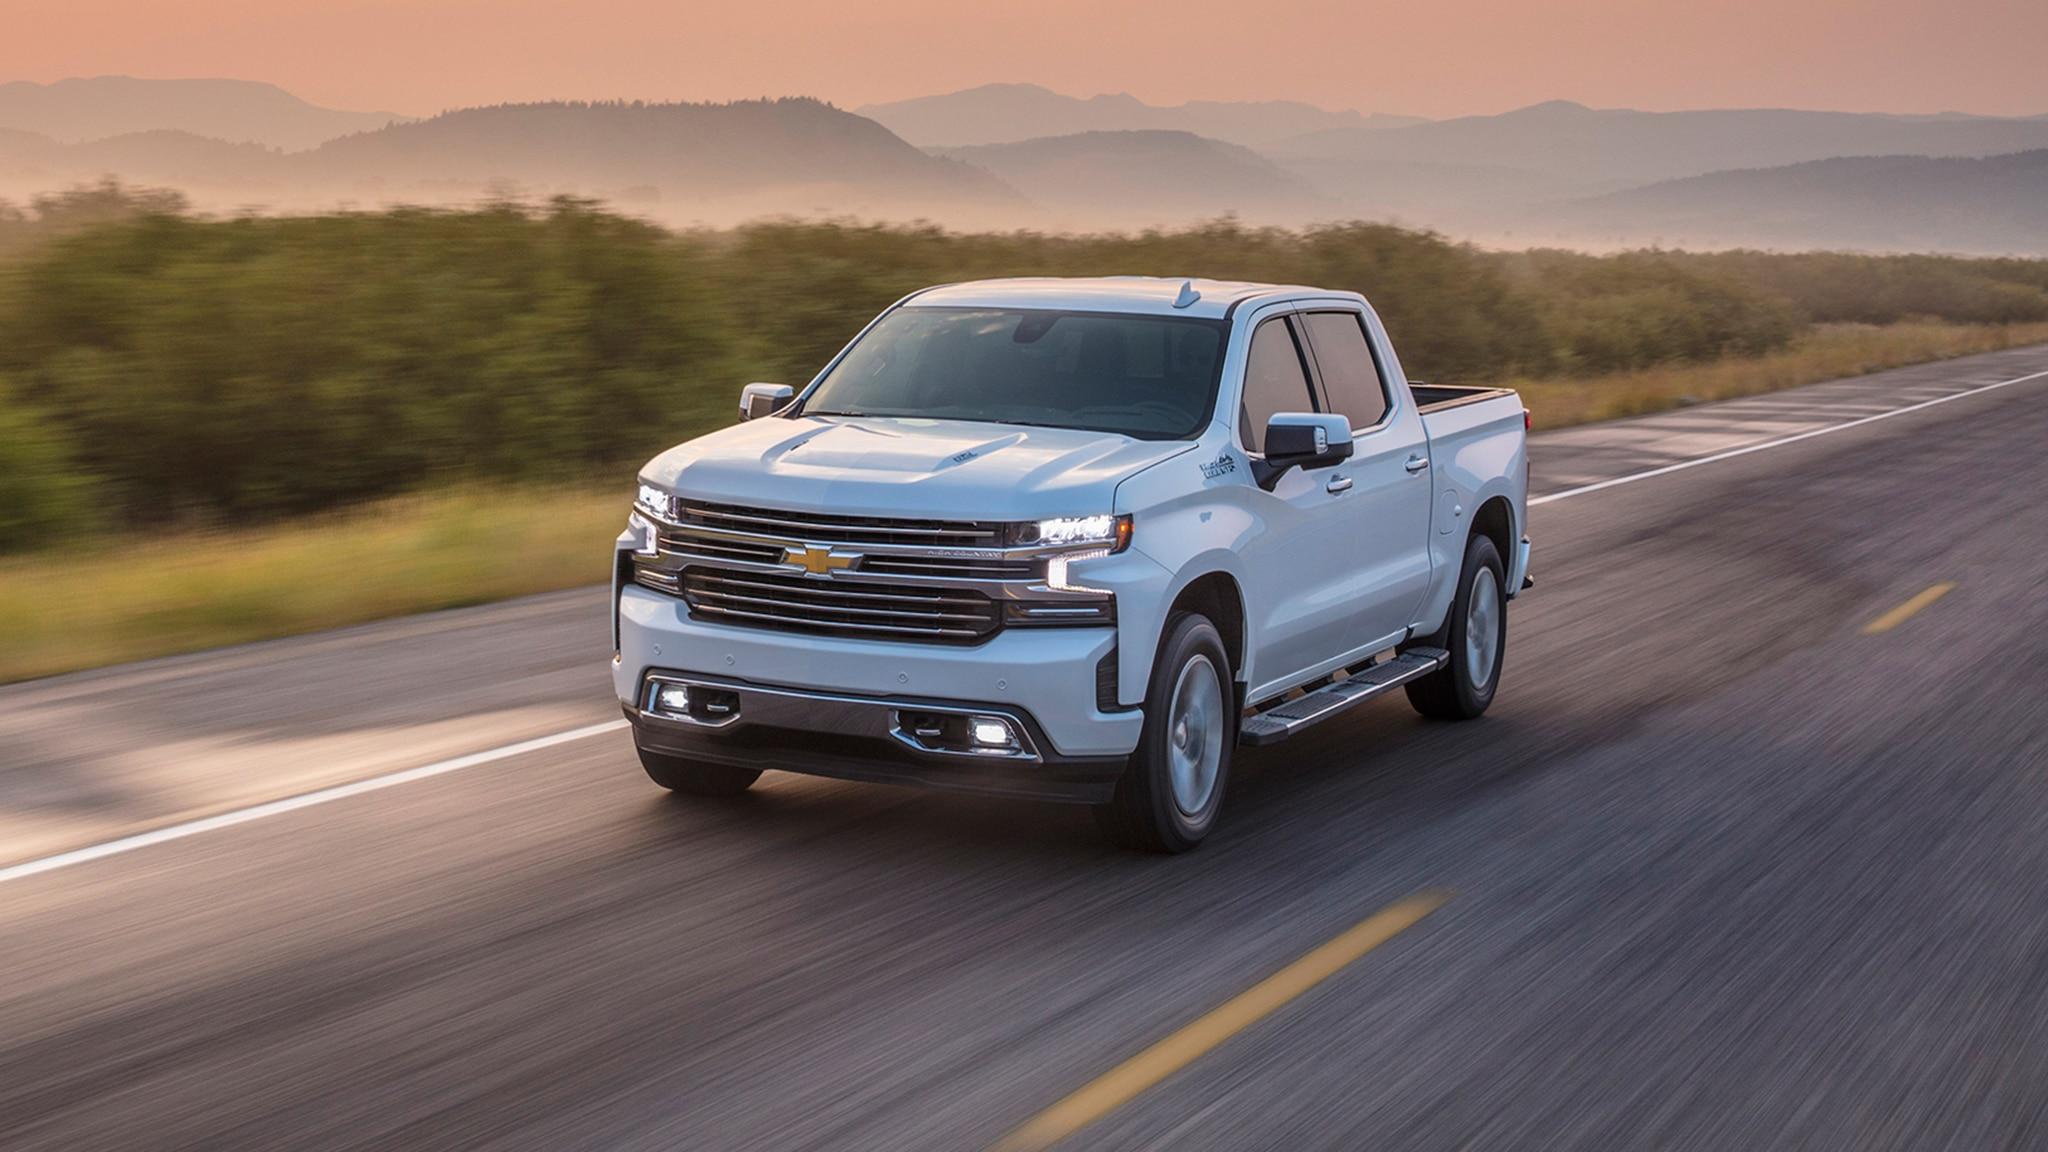 First Drive: 2019 Chevrolet Silverado High Country